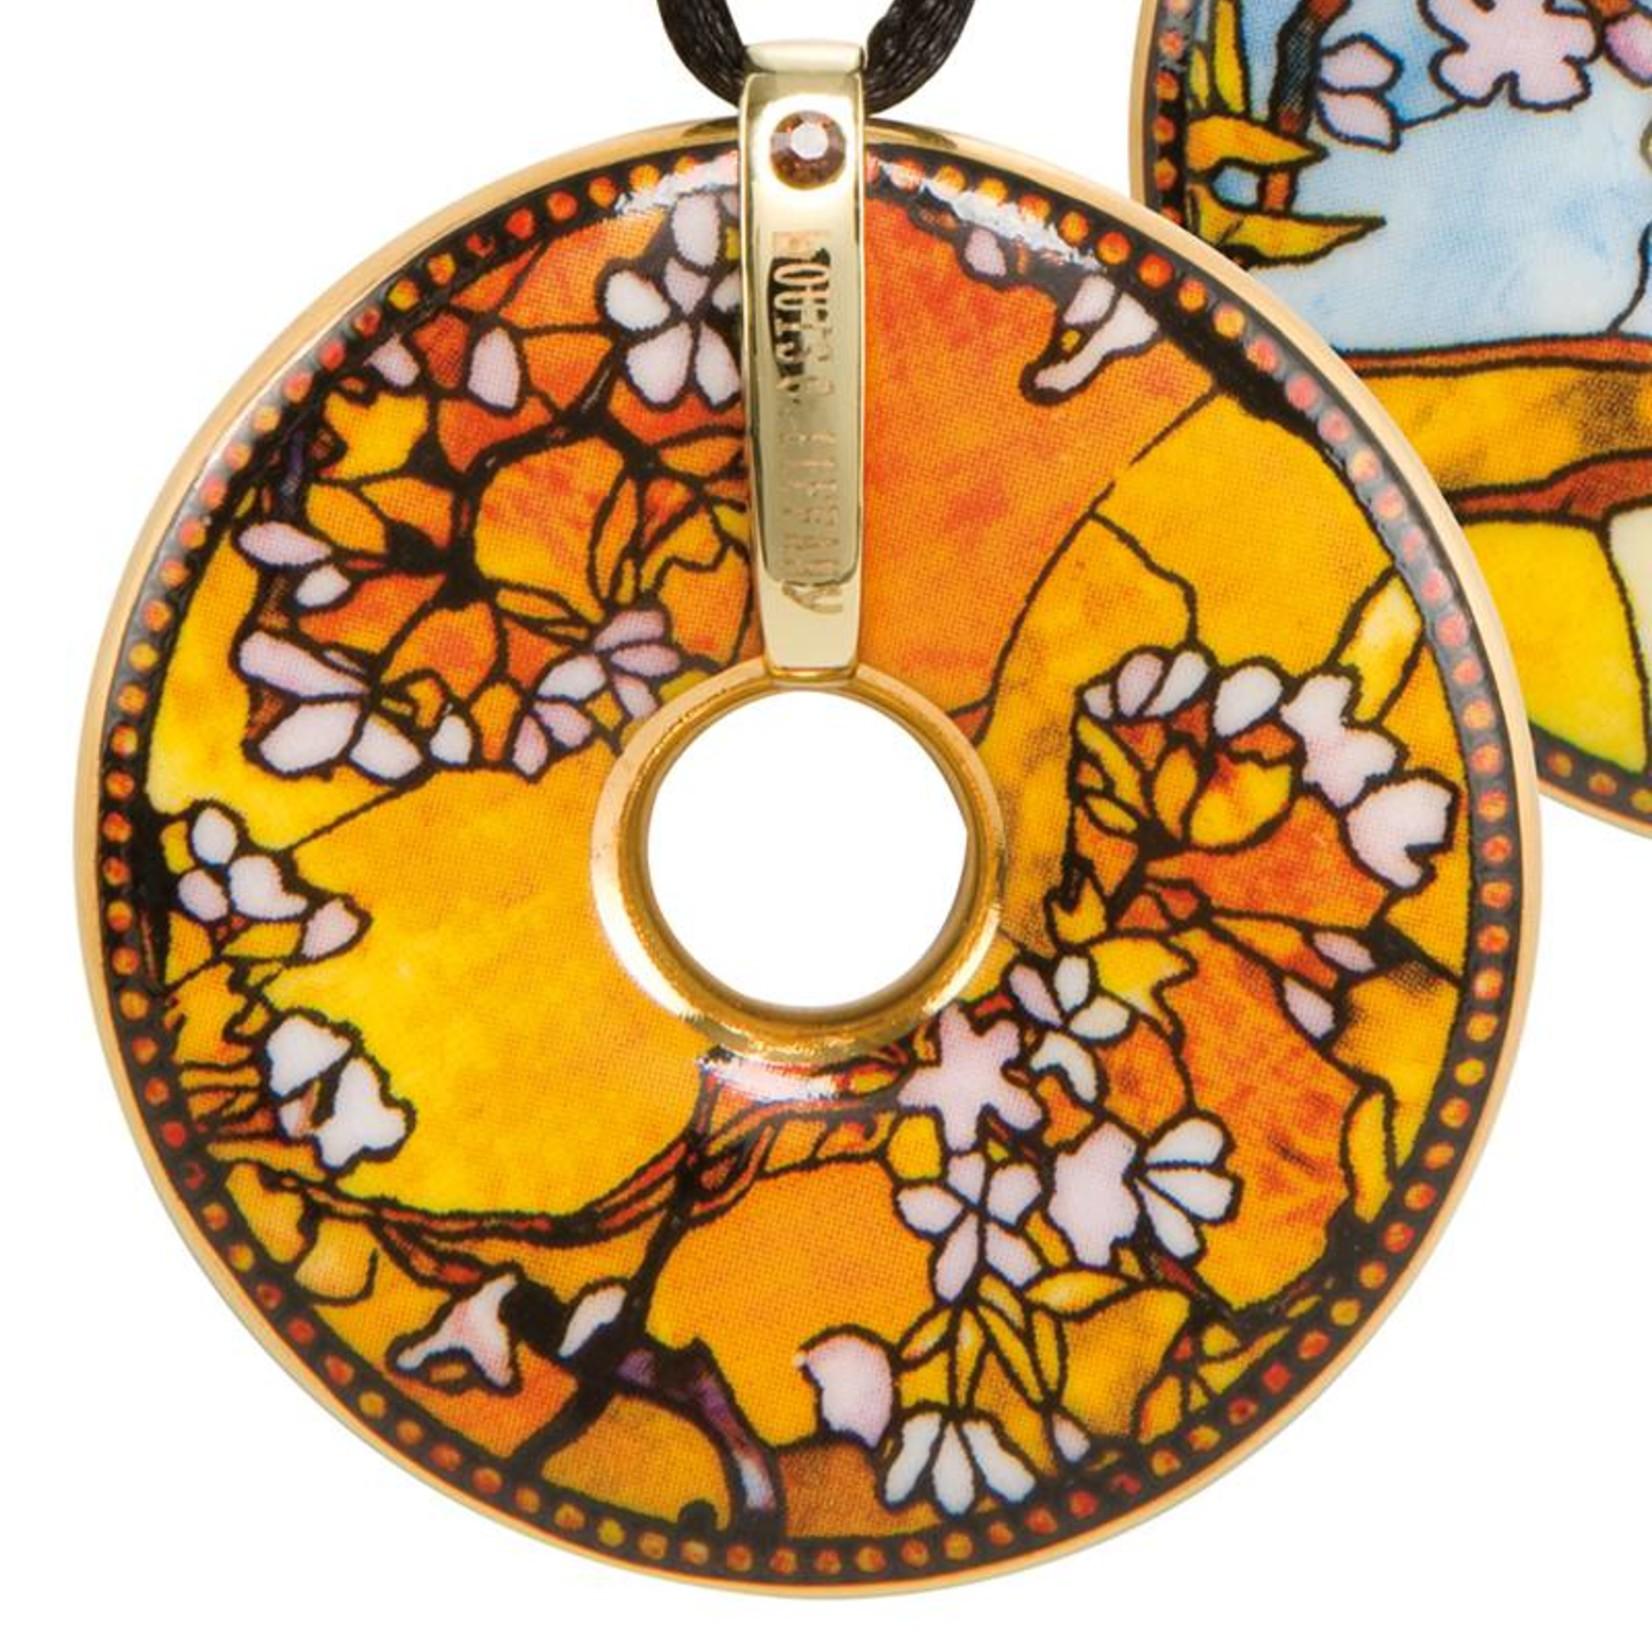 Goebel Porzellanmanufaktur Kette Pfau I Goebel Porzellan I Louis Comfort Tiffany - Copy